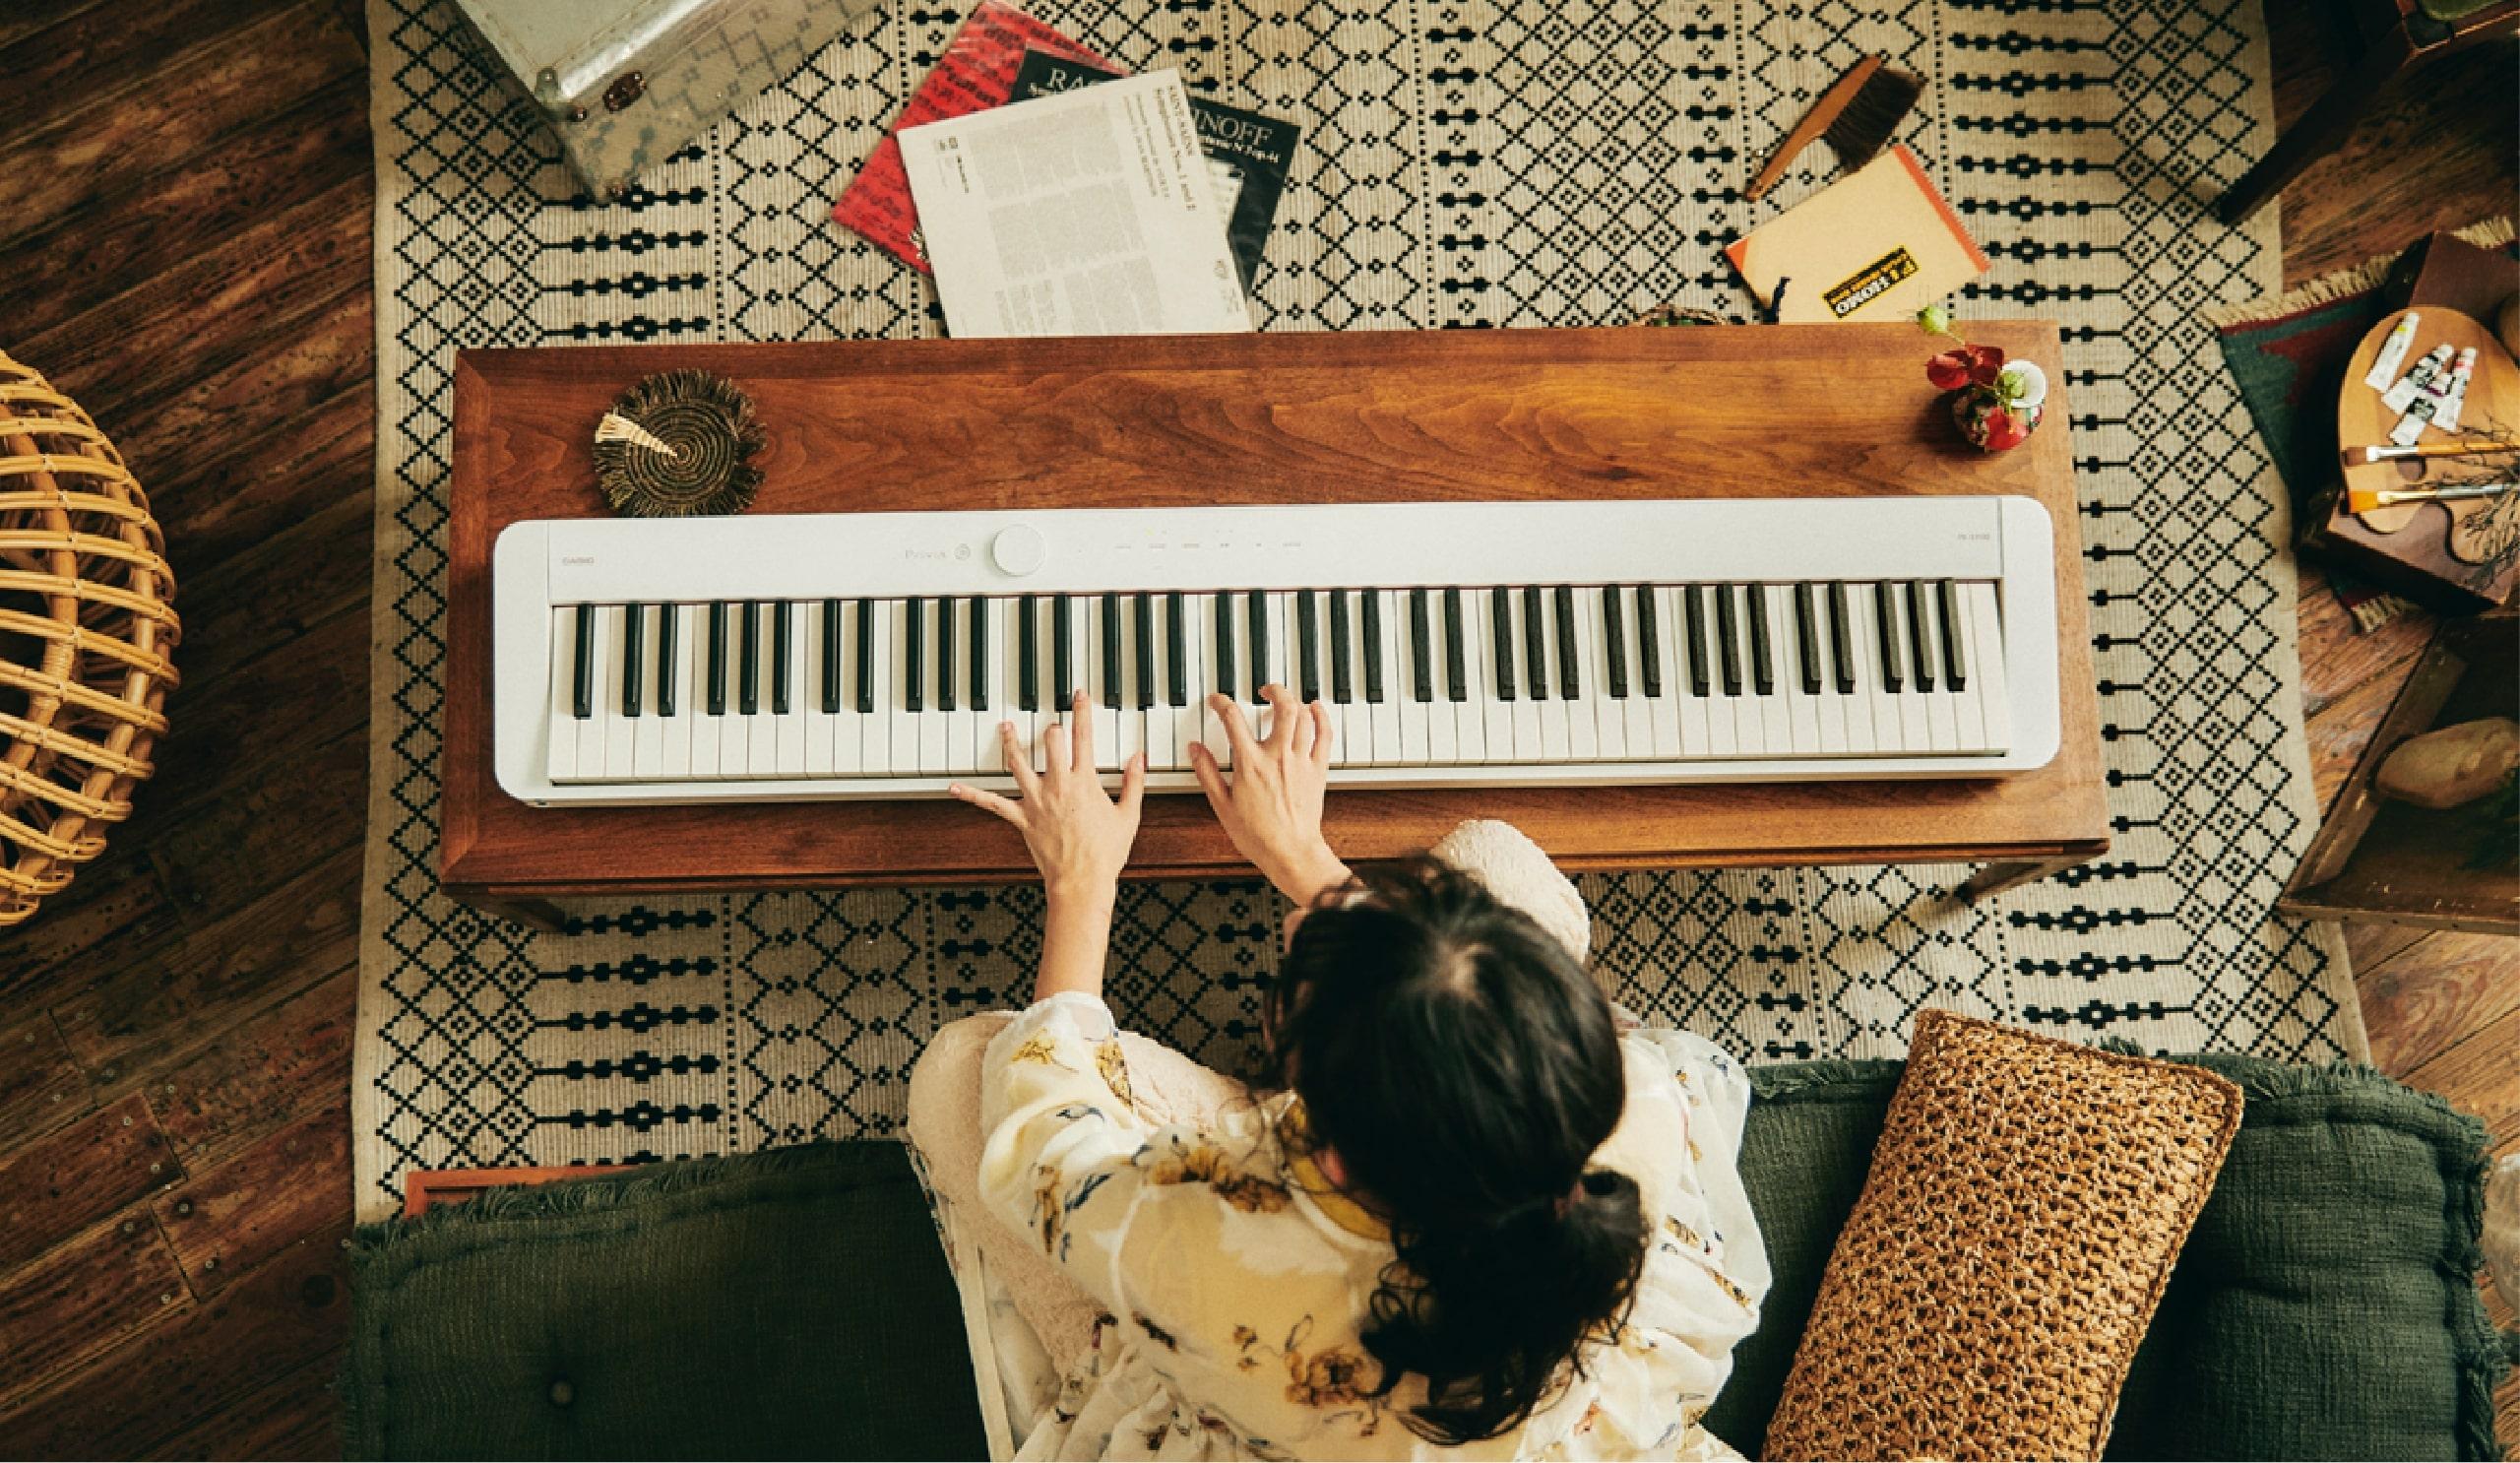 px-s1100 slimmest digital piano